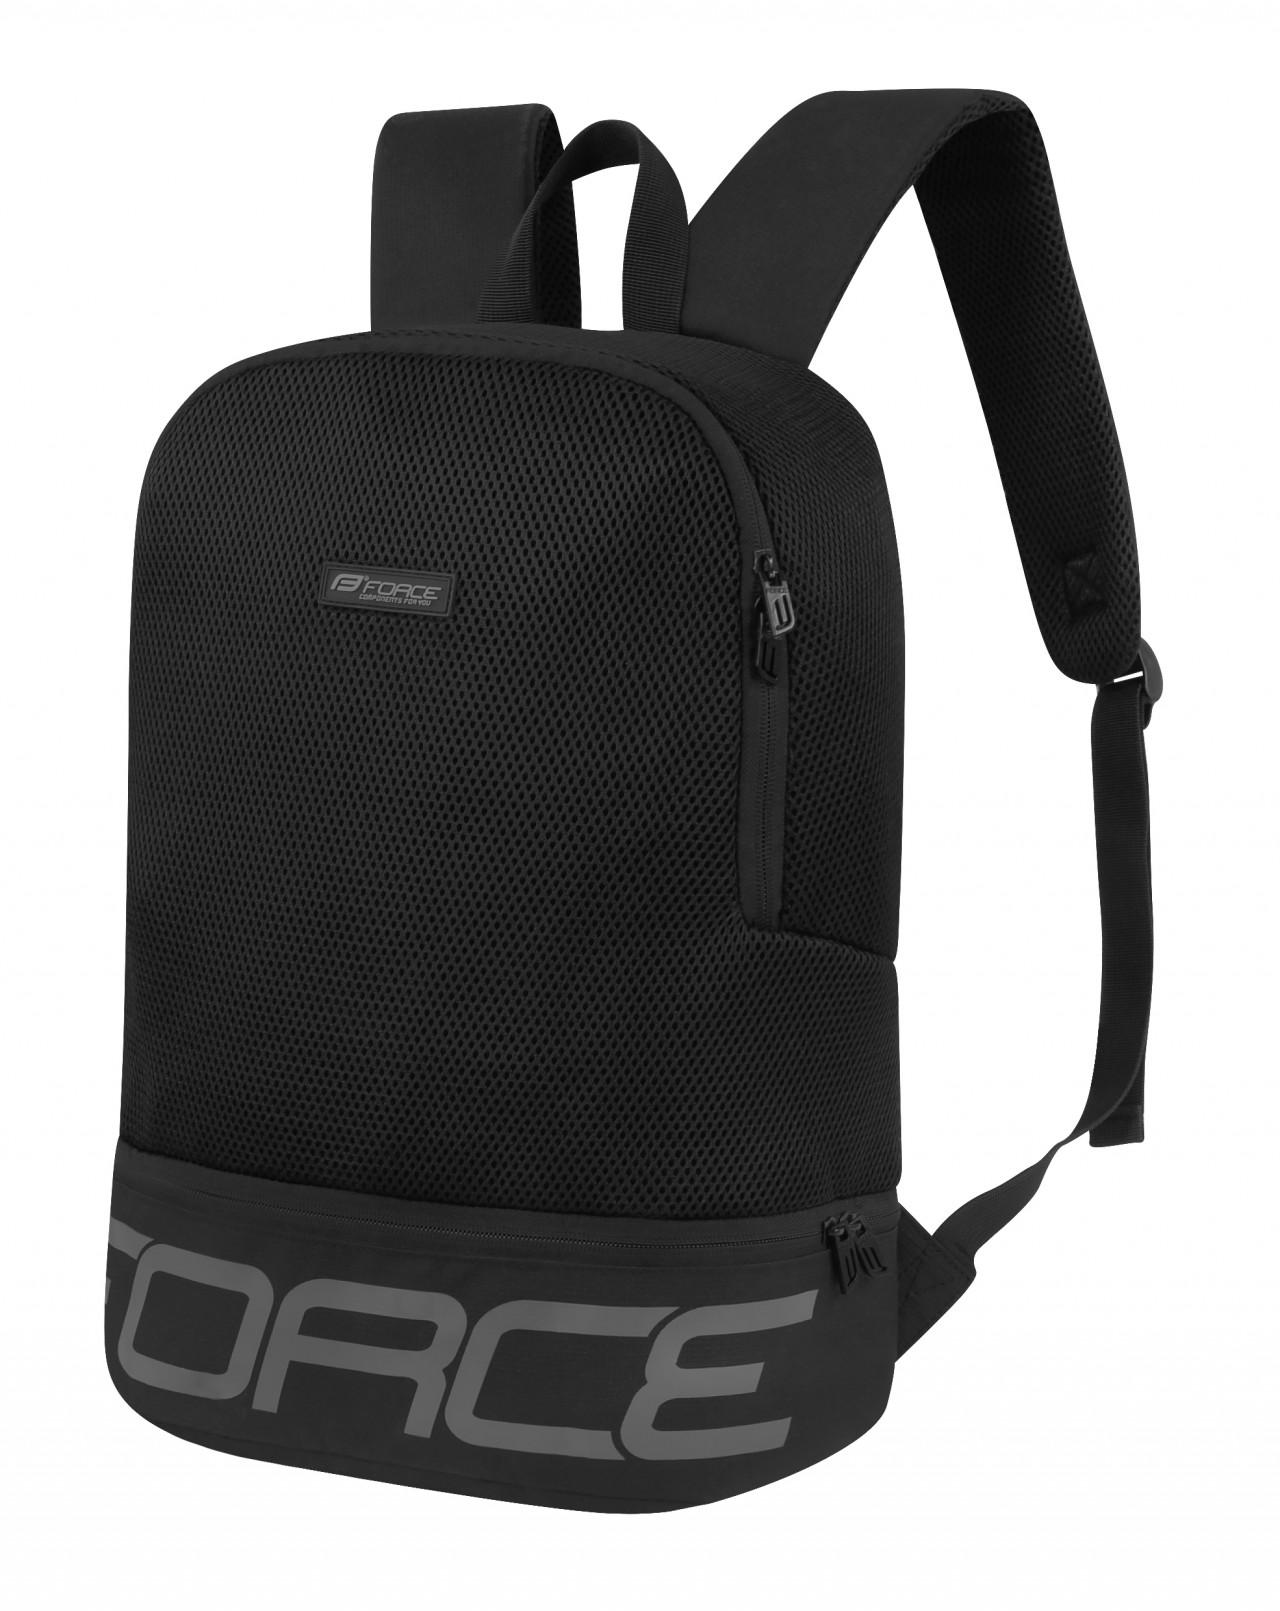 FORCE batoh AMAGER 20 L Čierno-šedý batoh